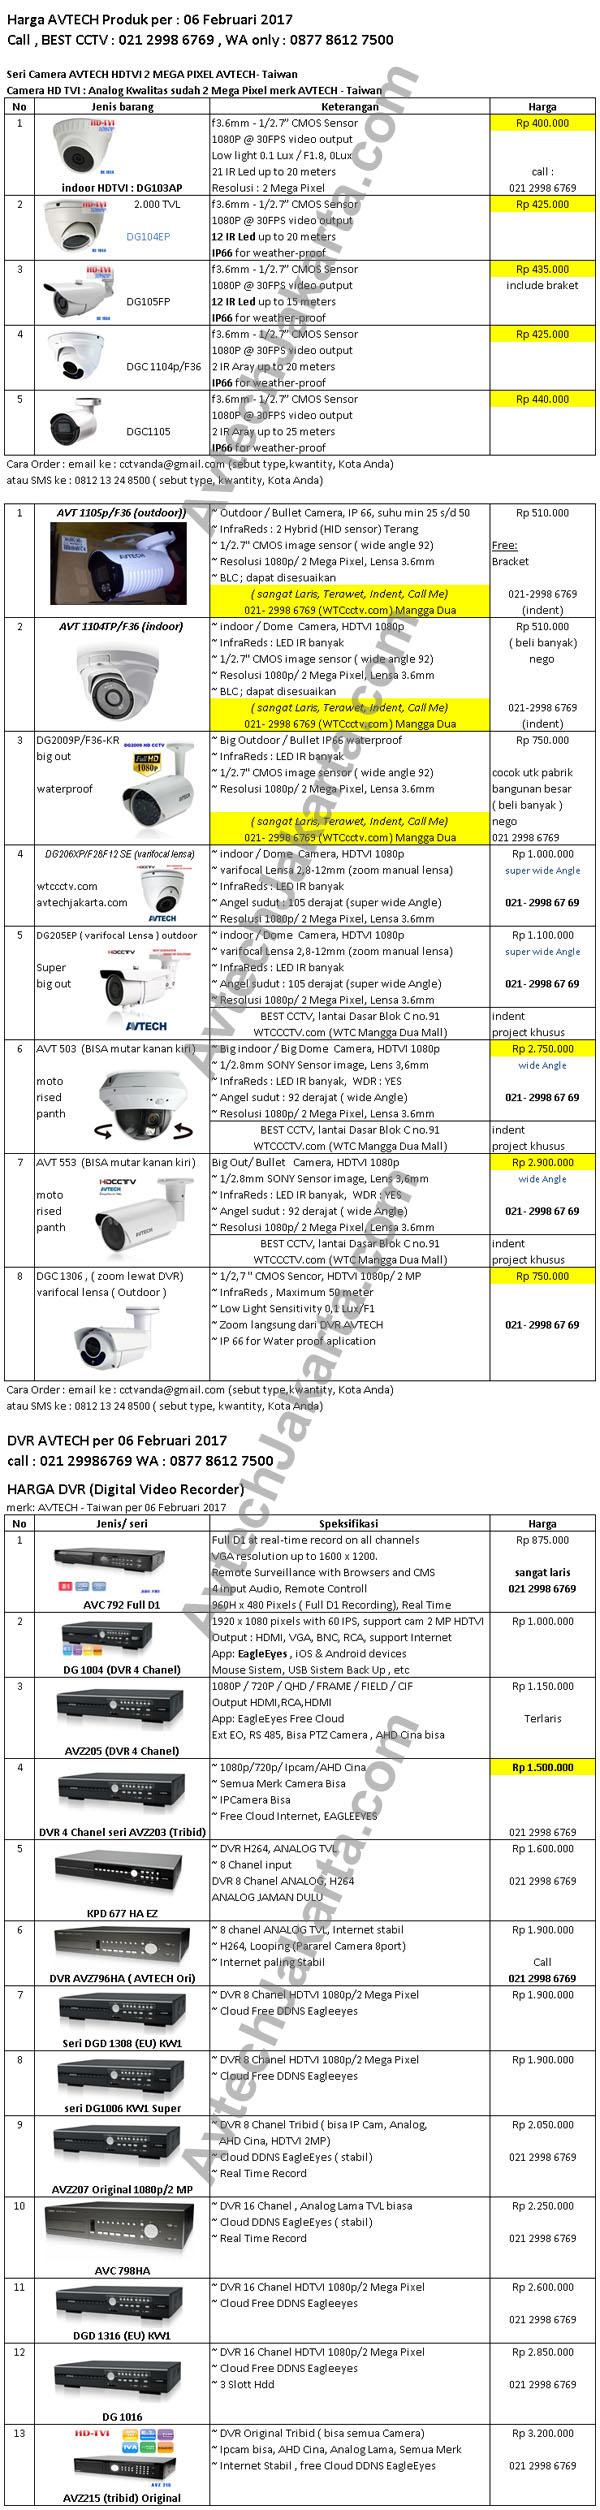 Harga Camera & DVR AVTECH made in Taiwan per 06 Februari 2017 Avtech Jakarta